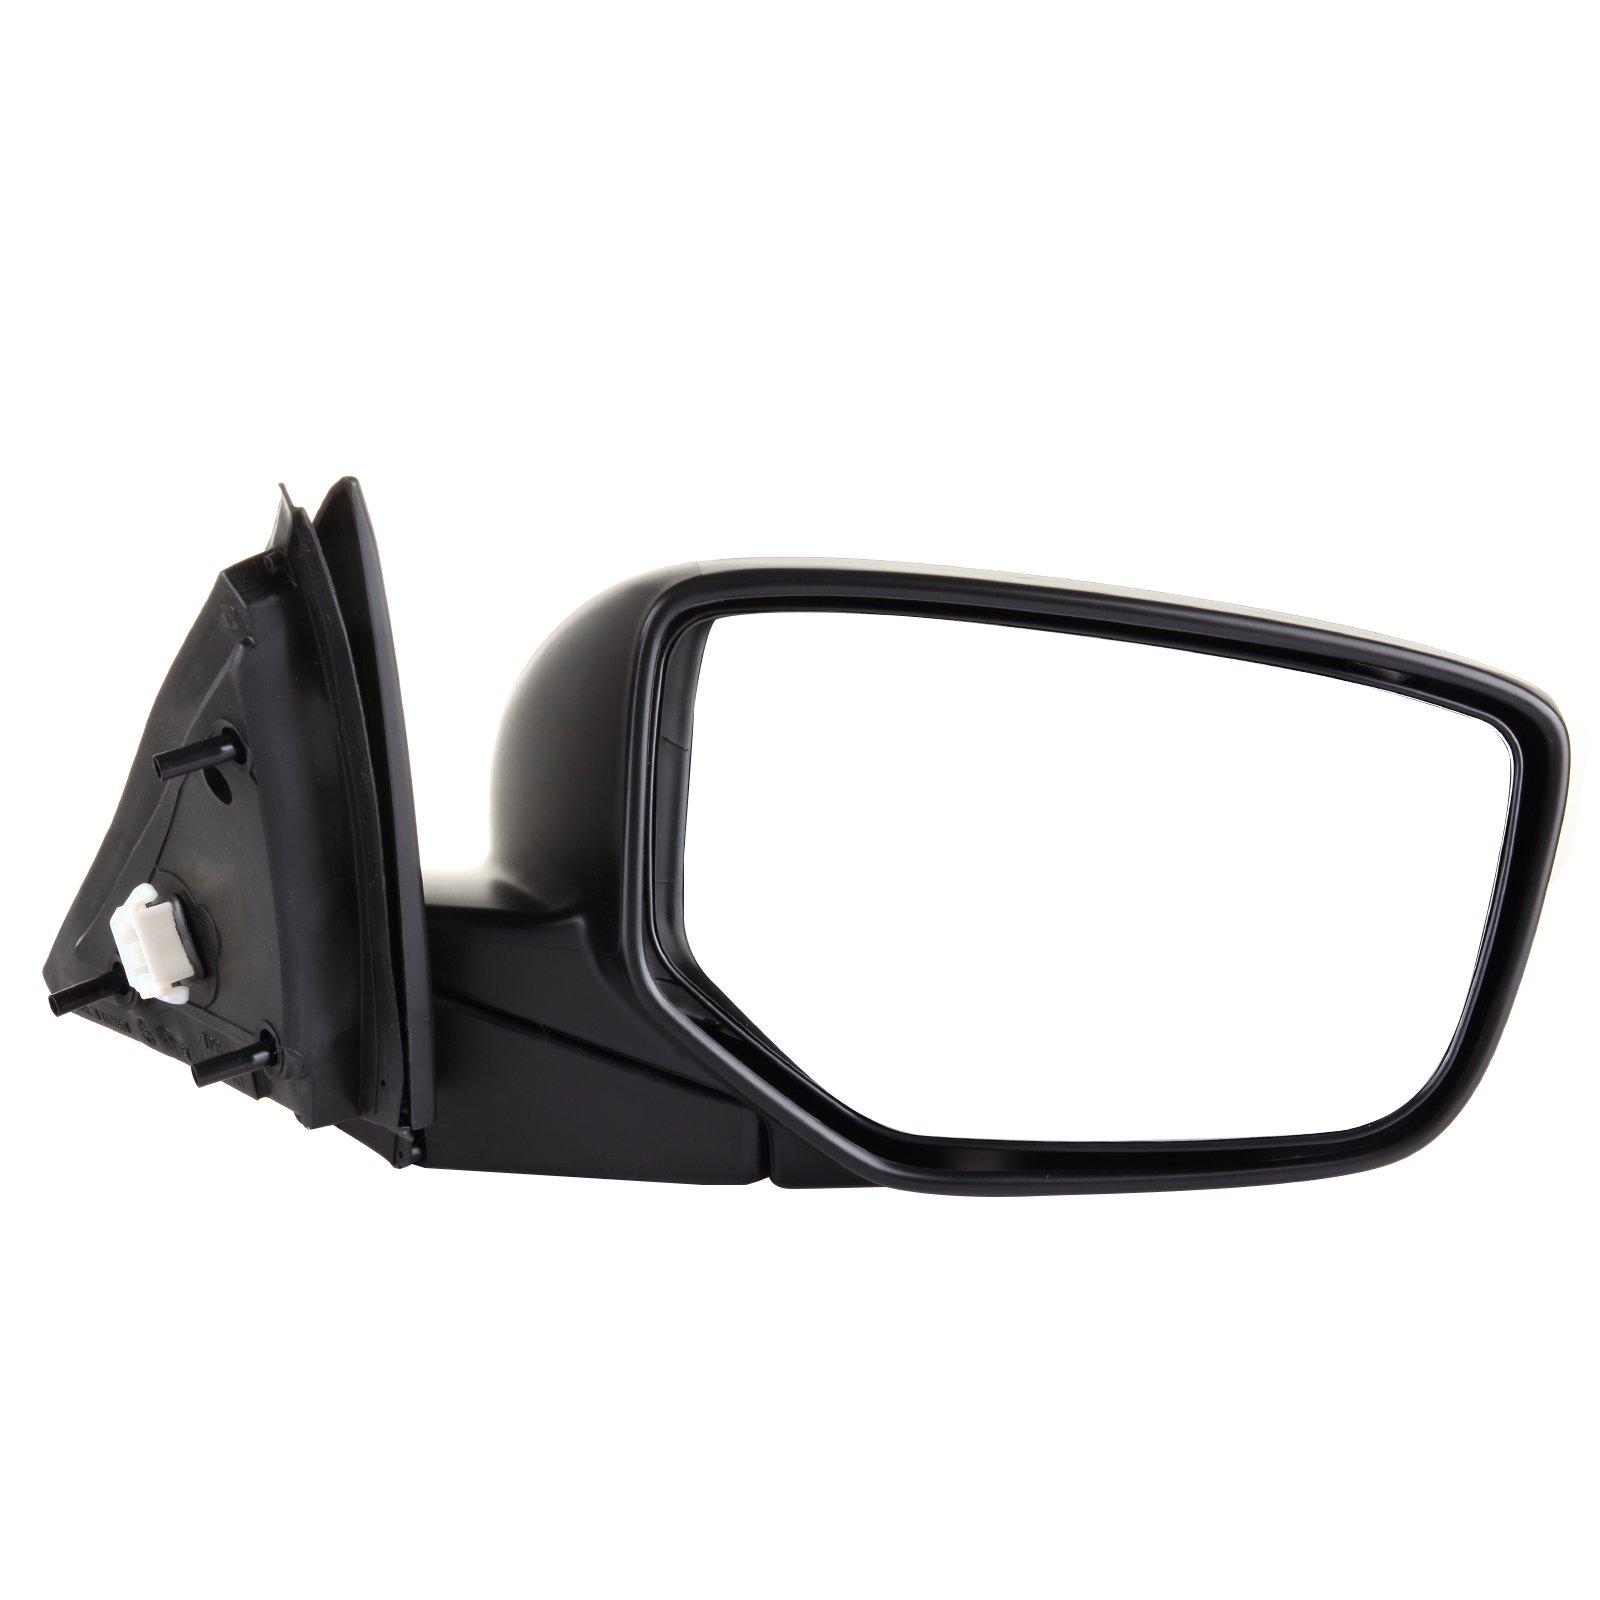 ECCPP Towing Mirror Compatible for 2008-2012 Honda Accord Sedan Power-Adjusting Manul-Folding Right Passenger Side Mirror by ECCPP